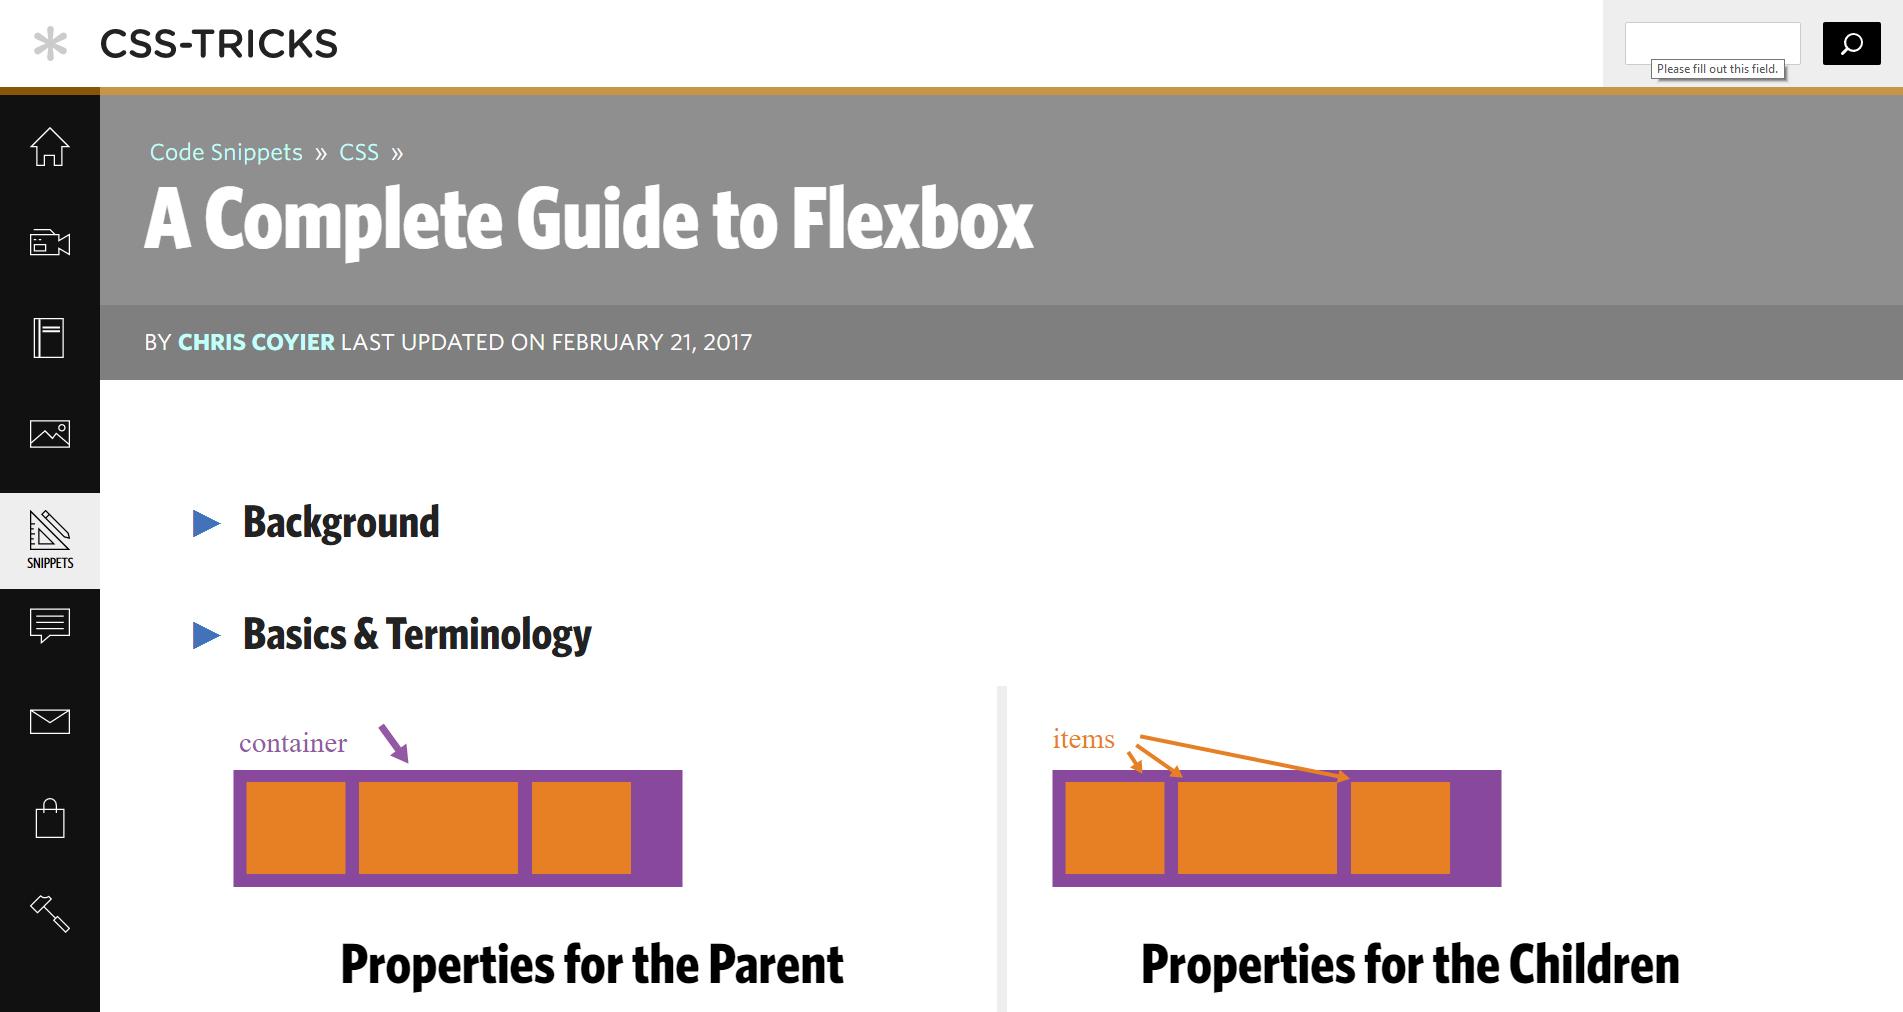 Adopting CSS Tricks-Style Menus, Hipsterized – PDX 20-30 Dev